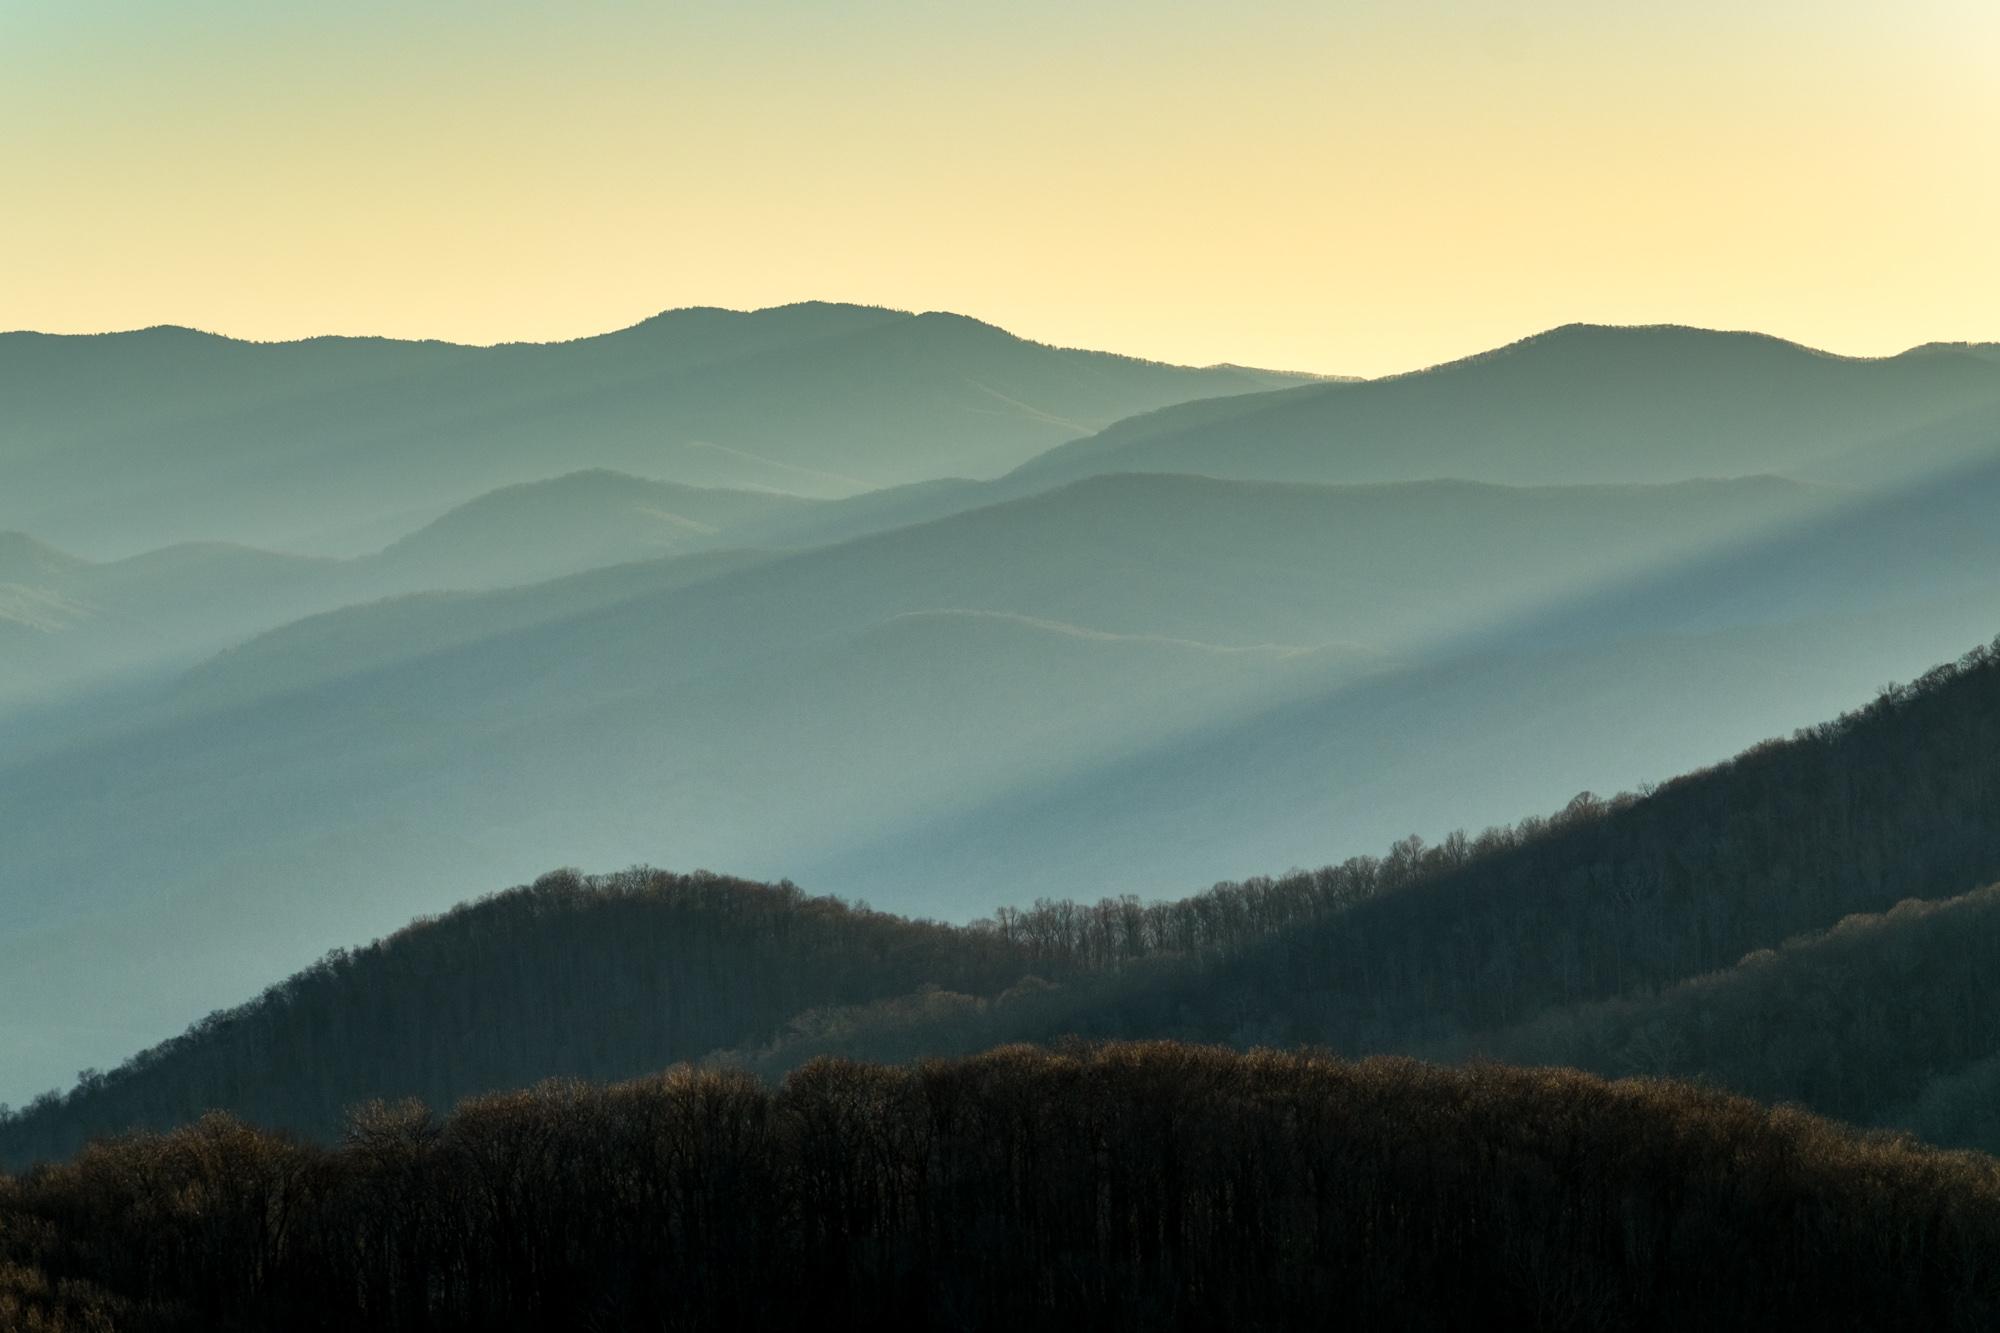 Sunlight streaks through the mountains.